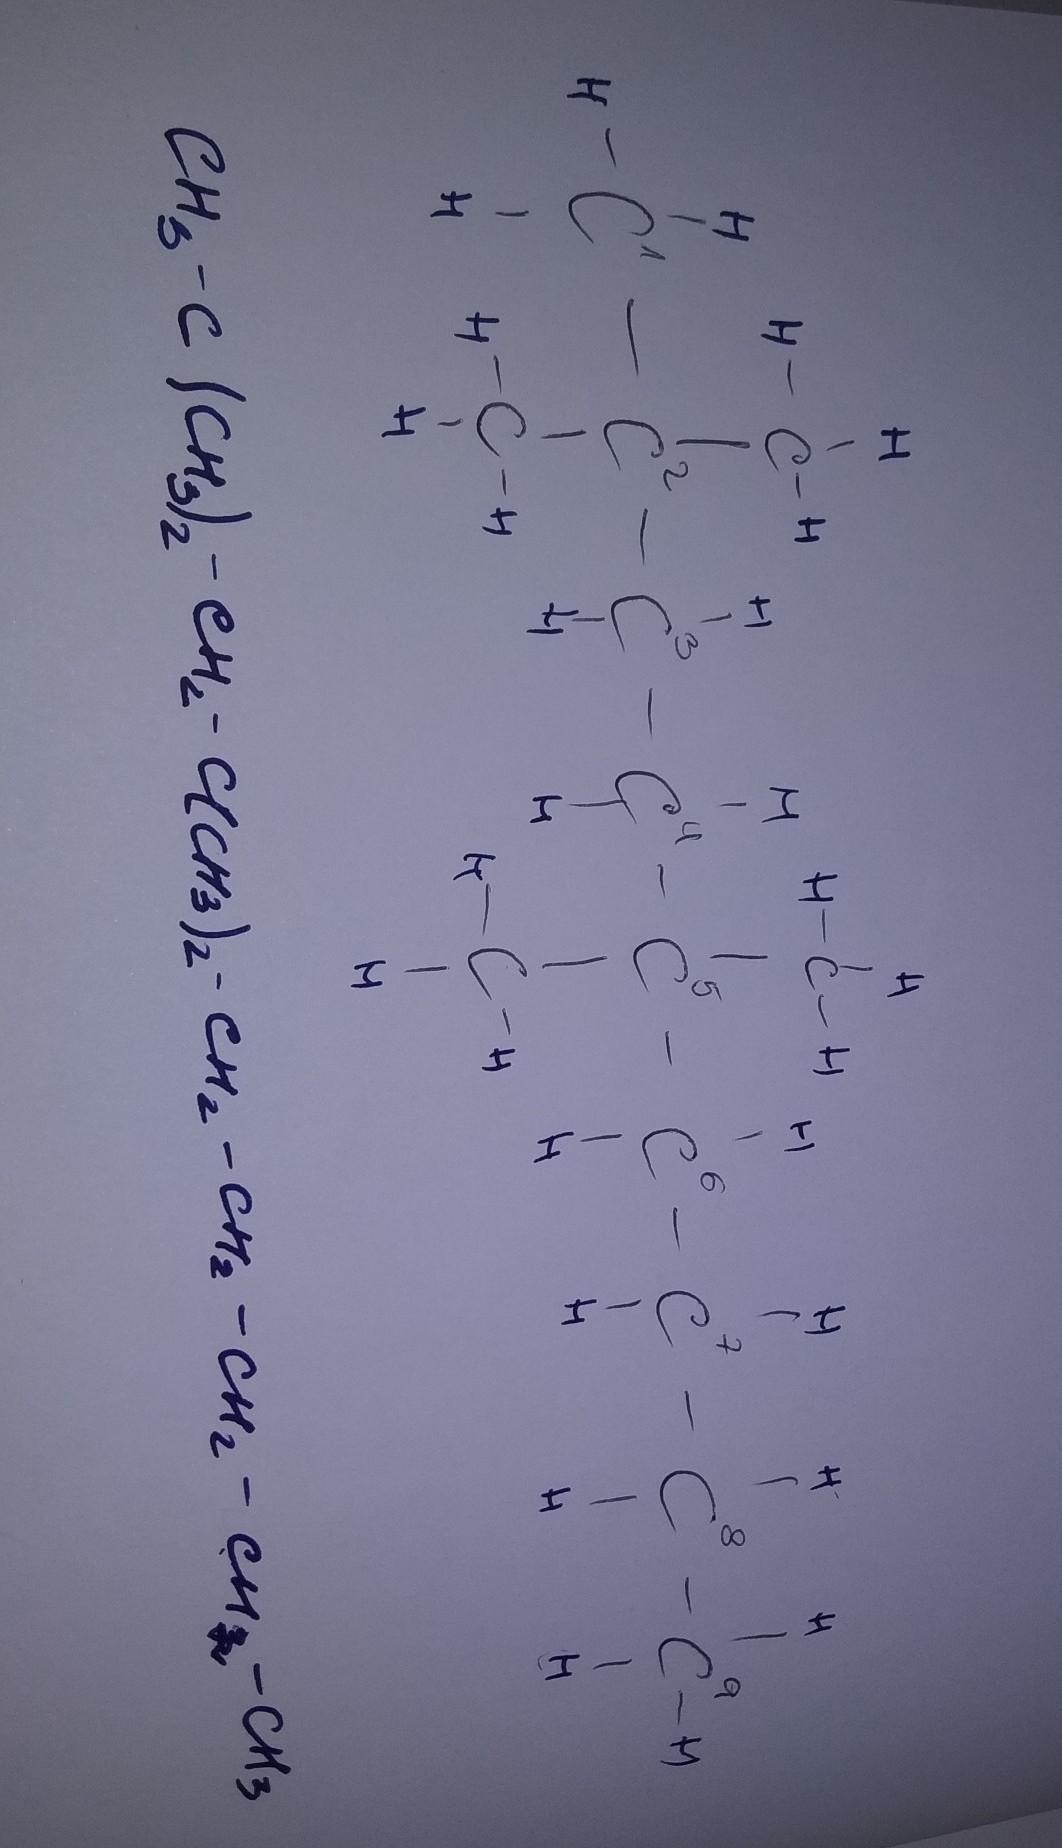 Напишите структурную формулу  2,2,5,5 -